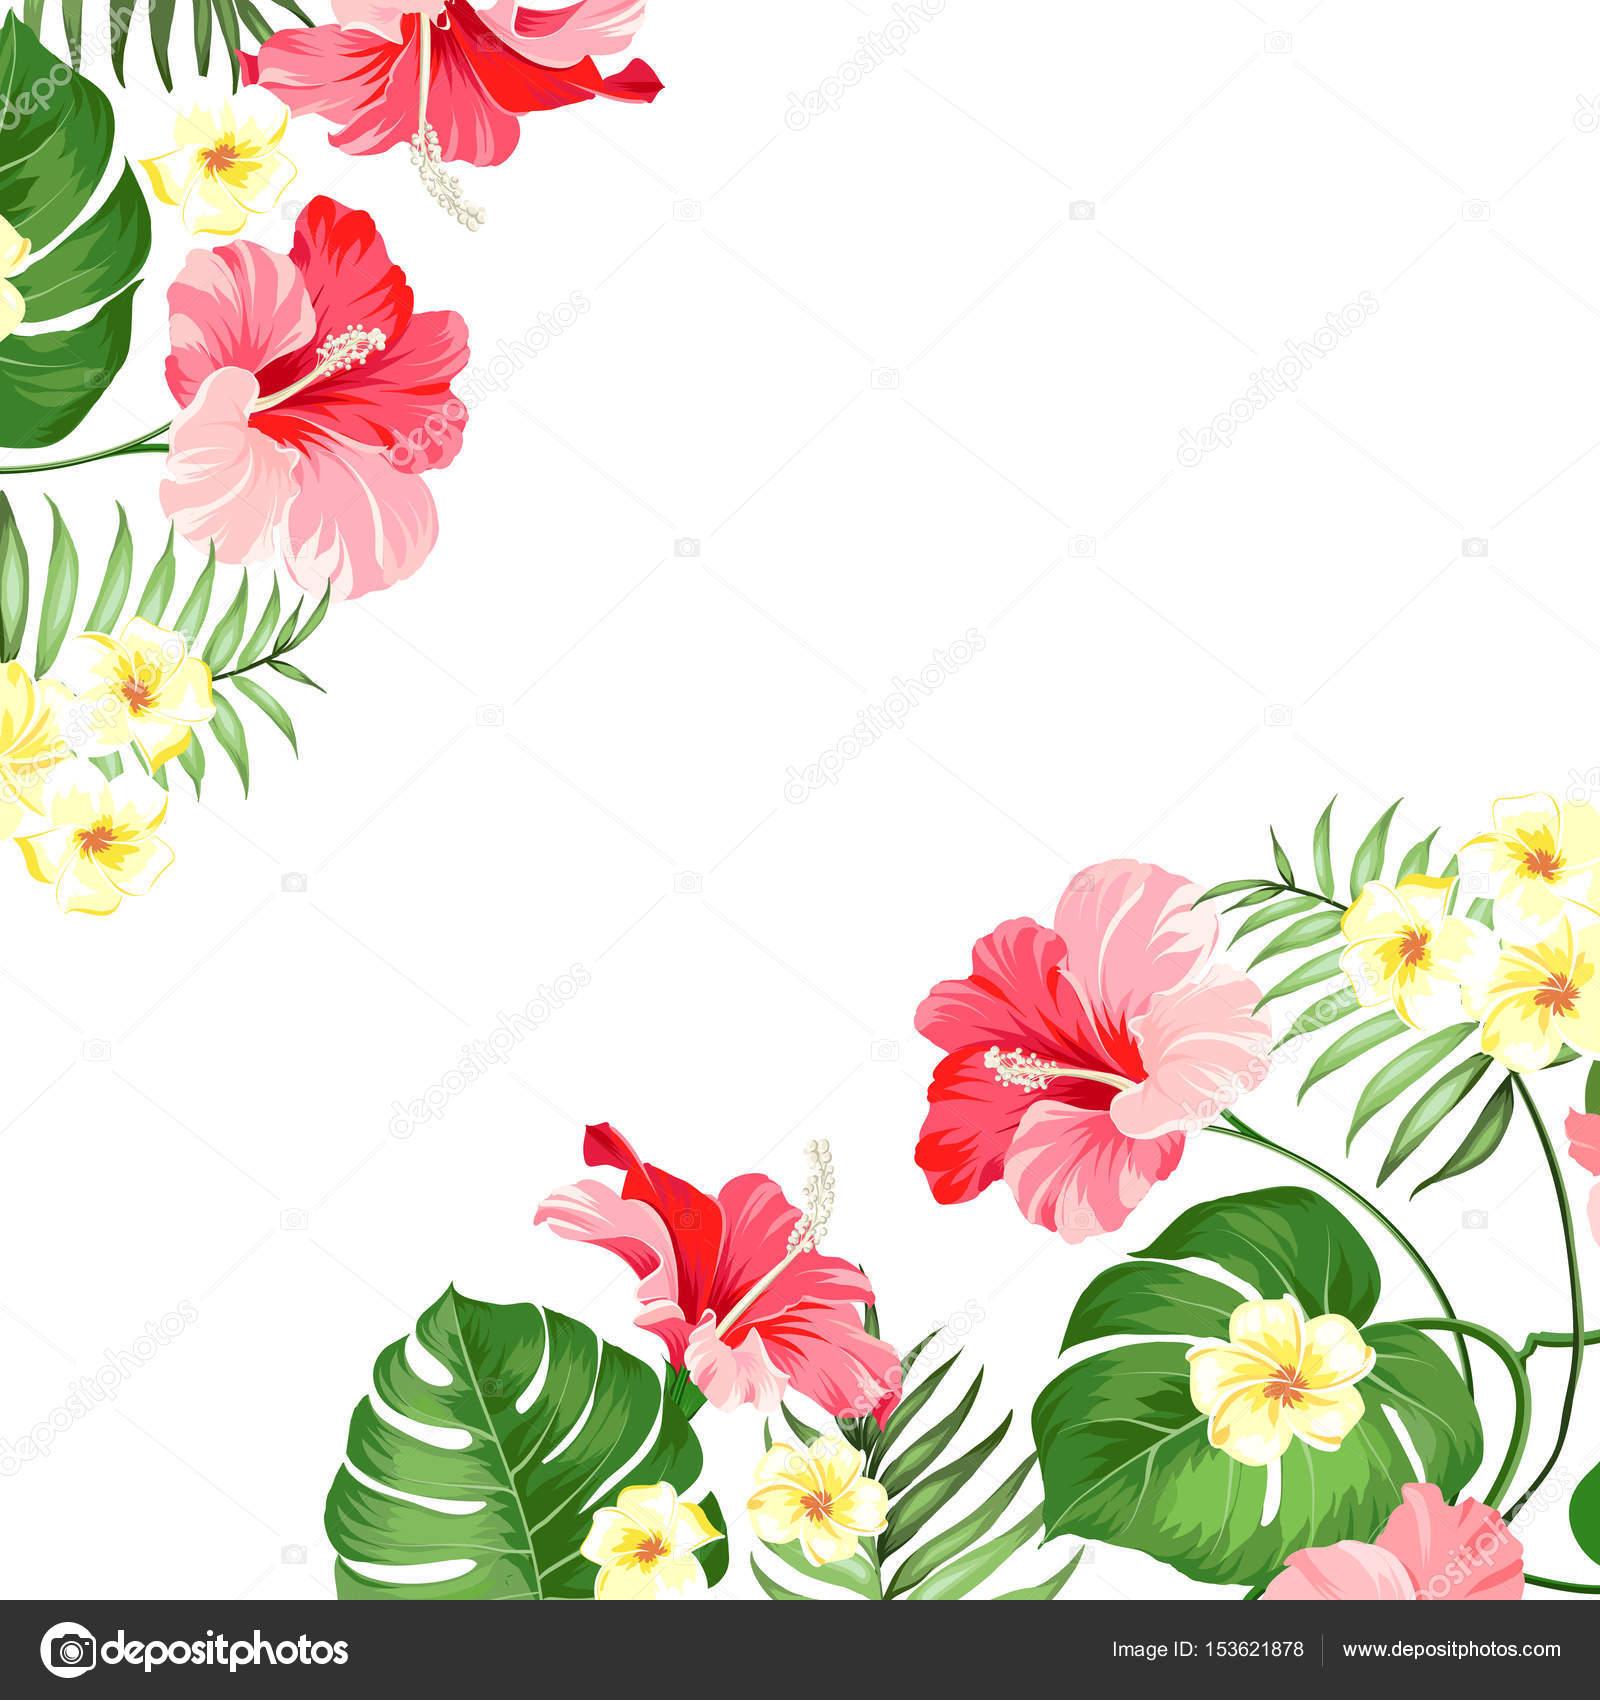 Tropical flower garland stock vector kotkoa 153621878 tropical flower garland stock vector izmirmasajfo